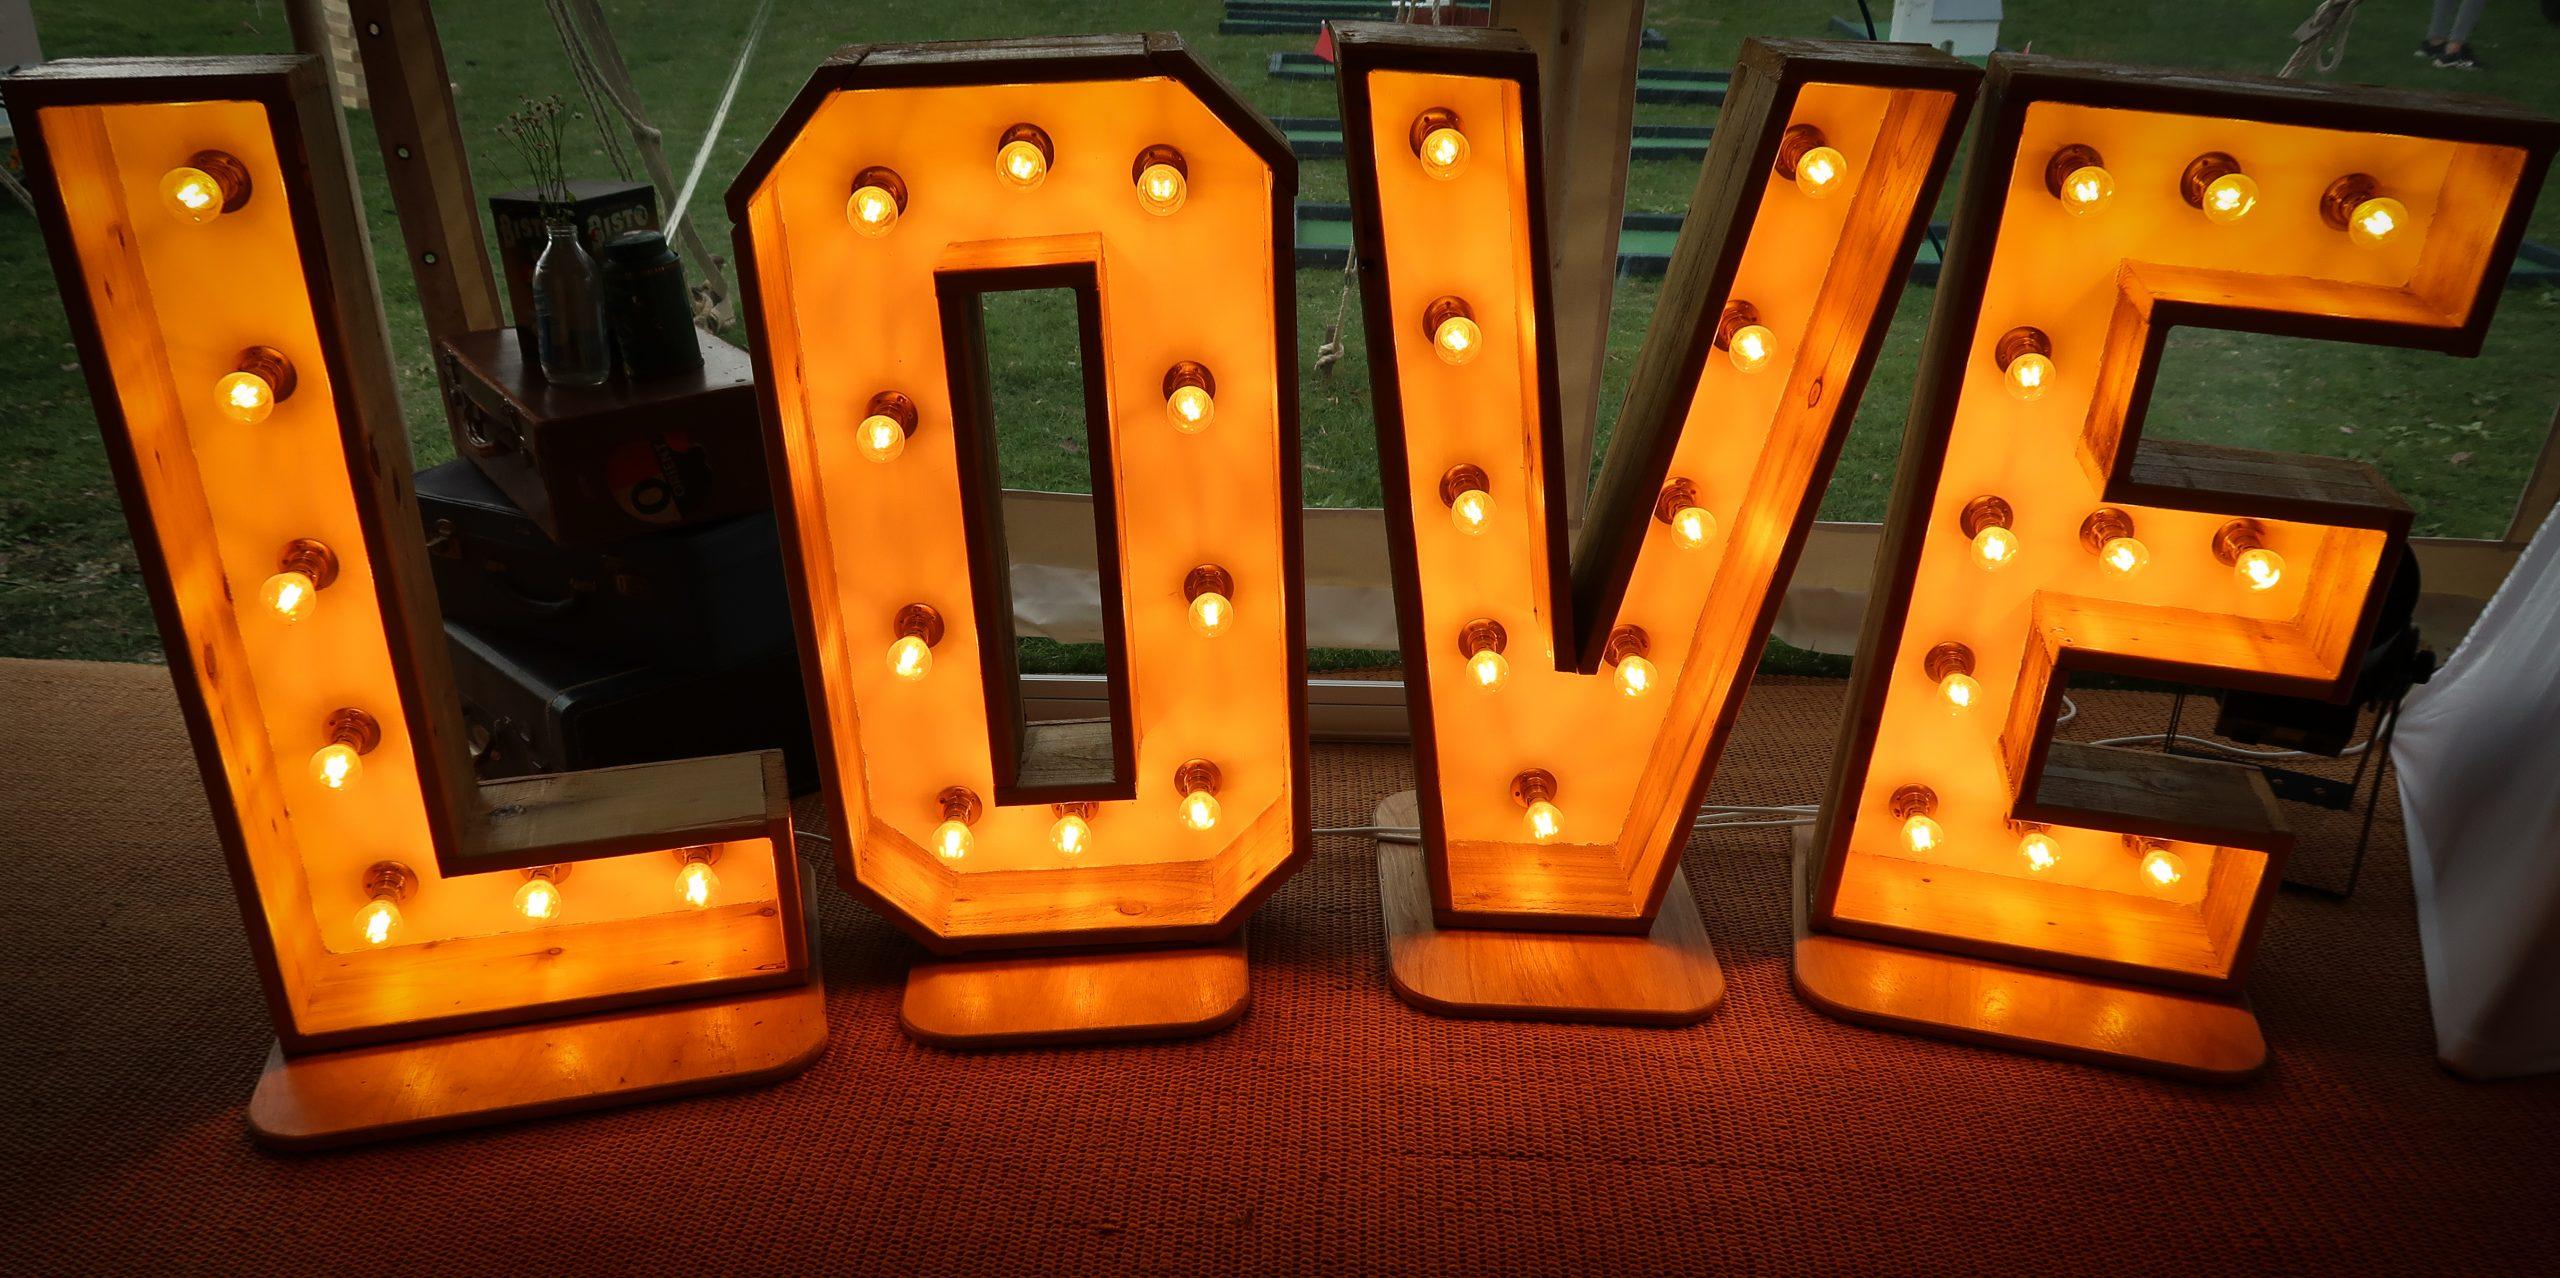 Love letters set up